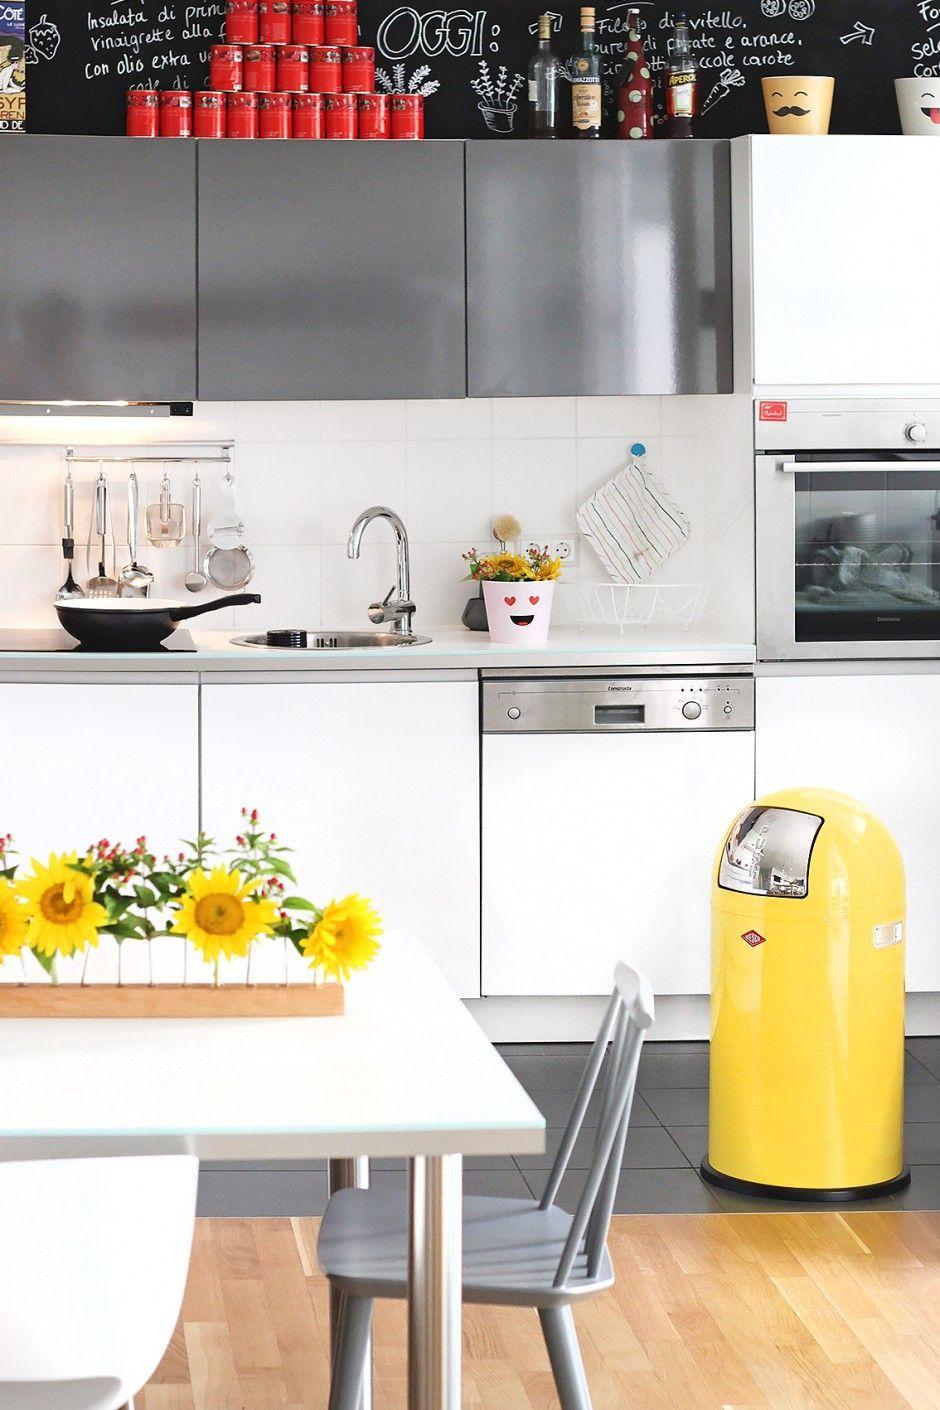 Pushboy und Upcycling | Küche planen, Lernturm ikea ...